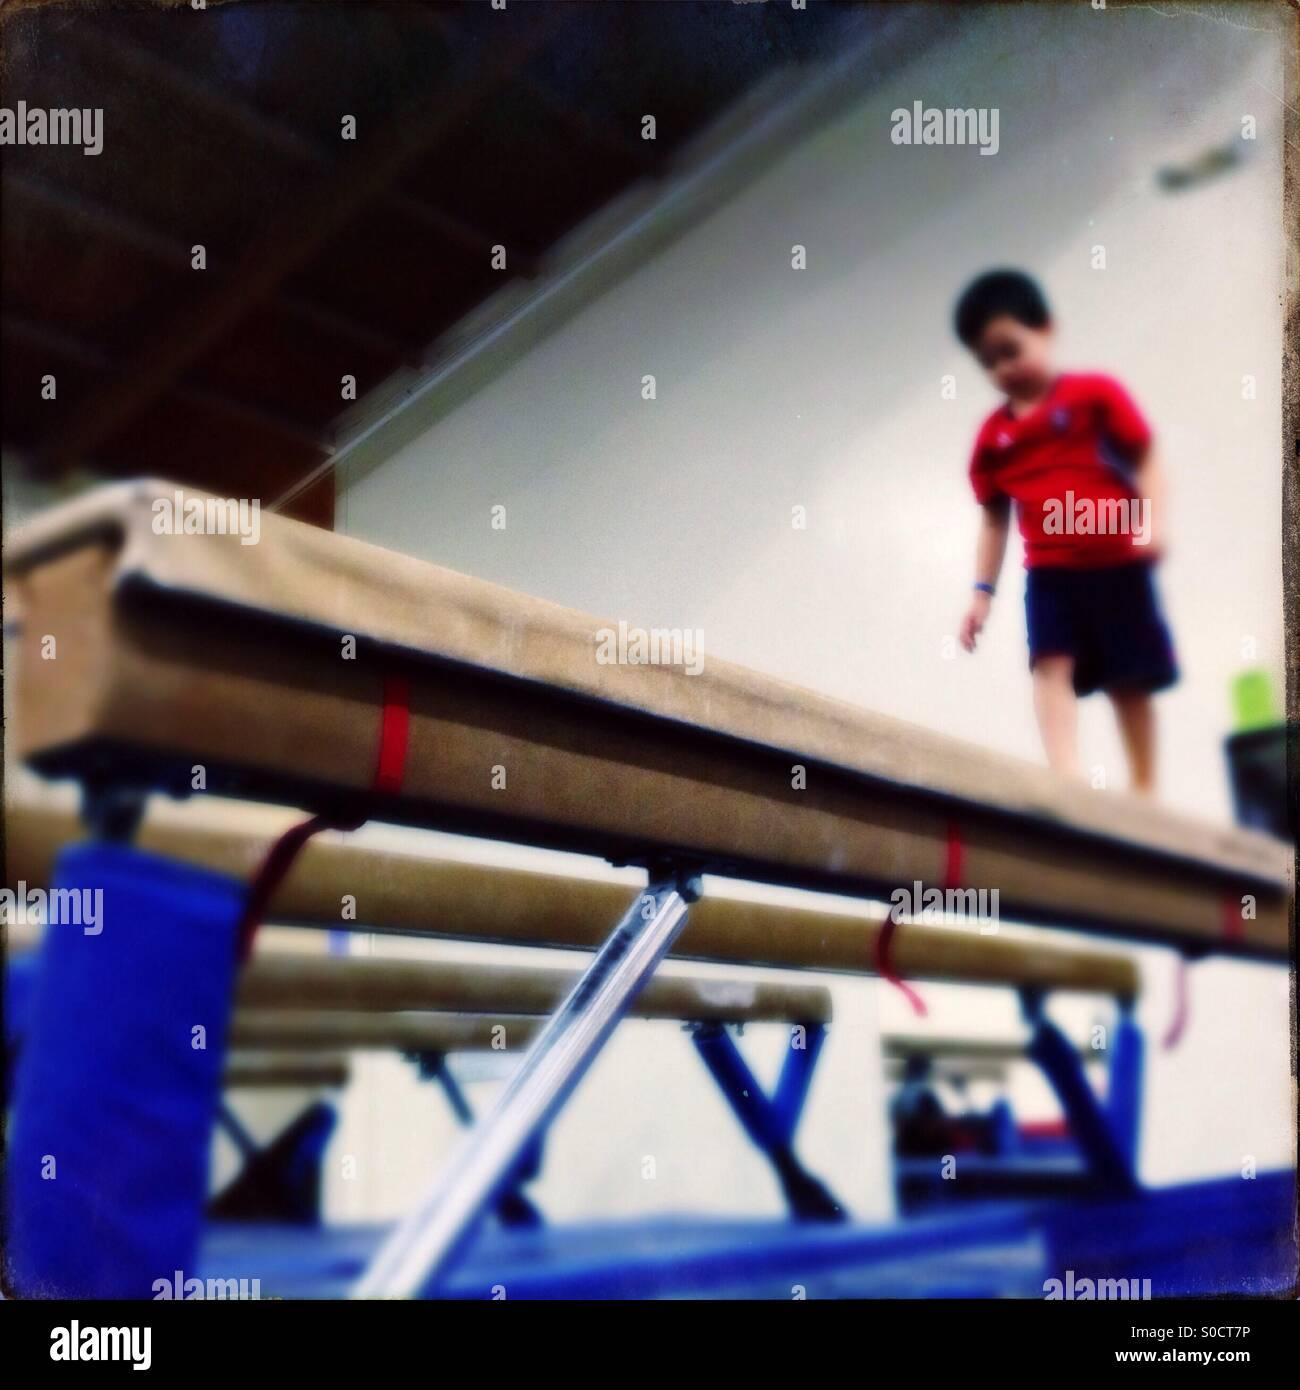 Boy on gymnastics balance beam - Stock Image